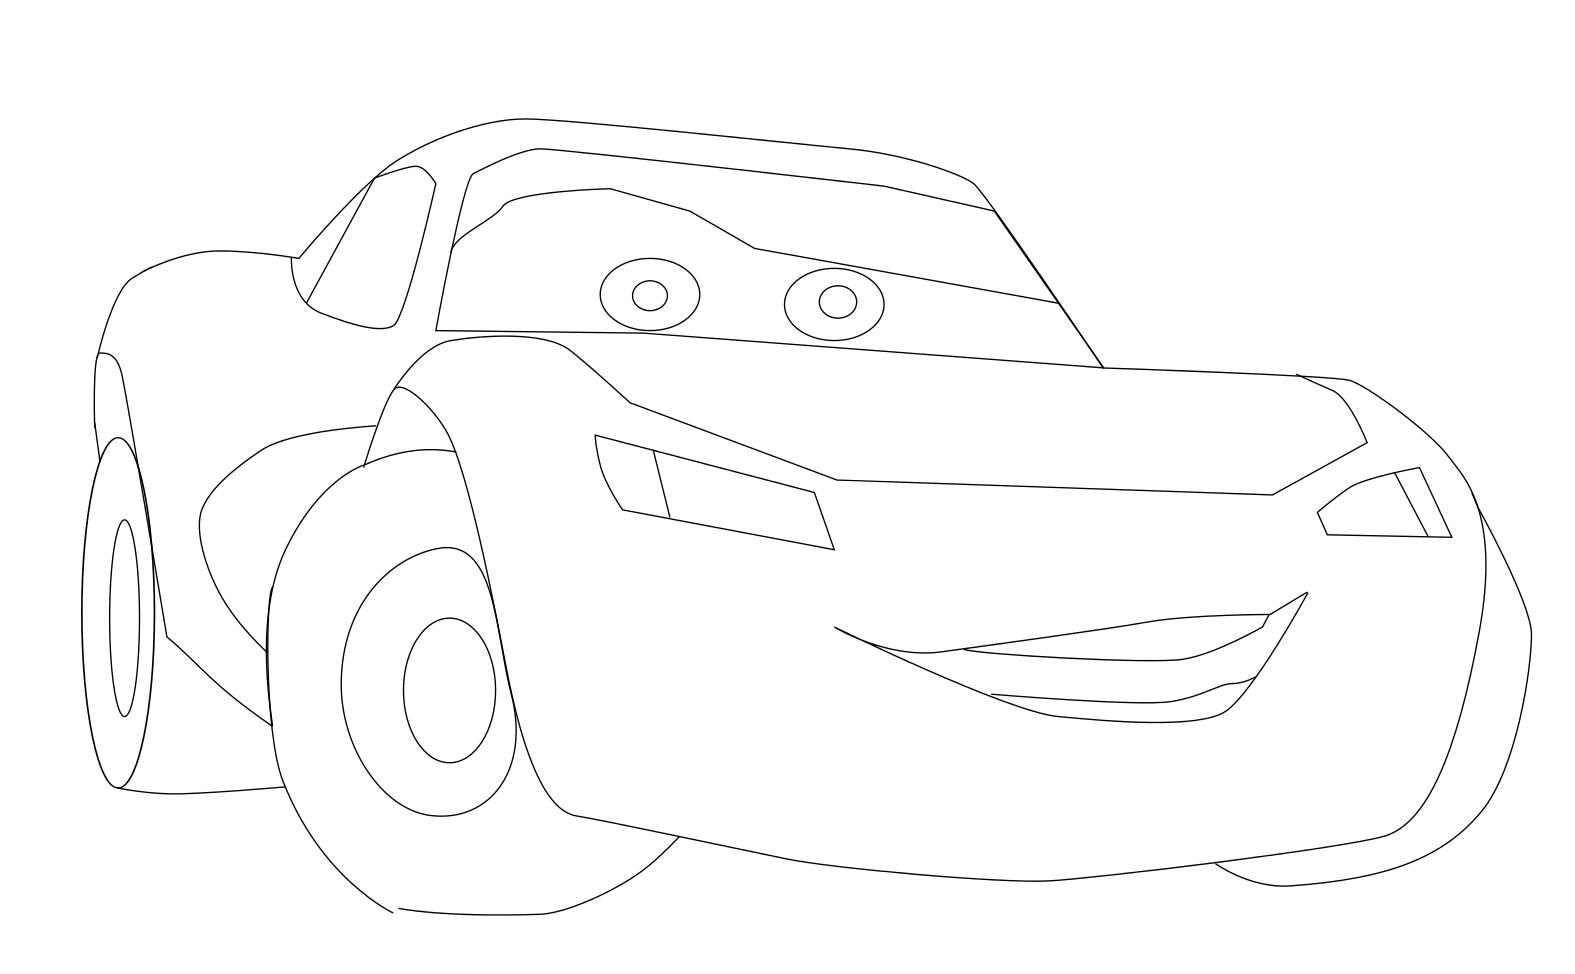 Coloriage cars flash mcqueen imprimer - Coloriage cars mcqueen ...